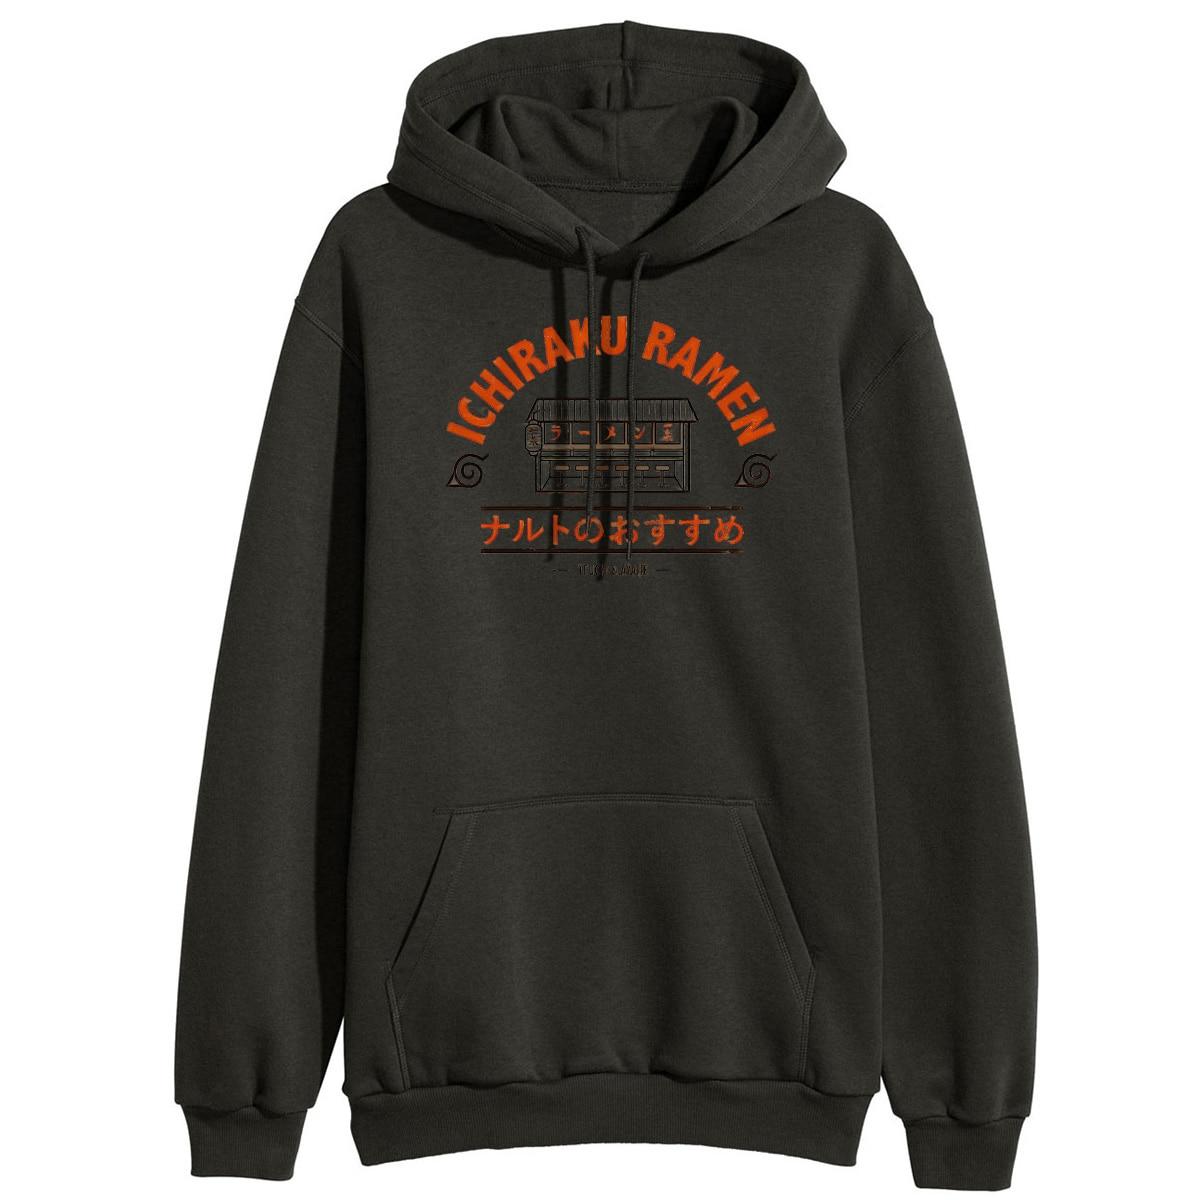 Naruto Ichiraku Ramen Japan Anime Hoodies Sweatshirt Women 2019 New Fashion Hooded Tracksuit Winter Warm Fleece Loose Hoodies